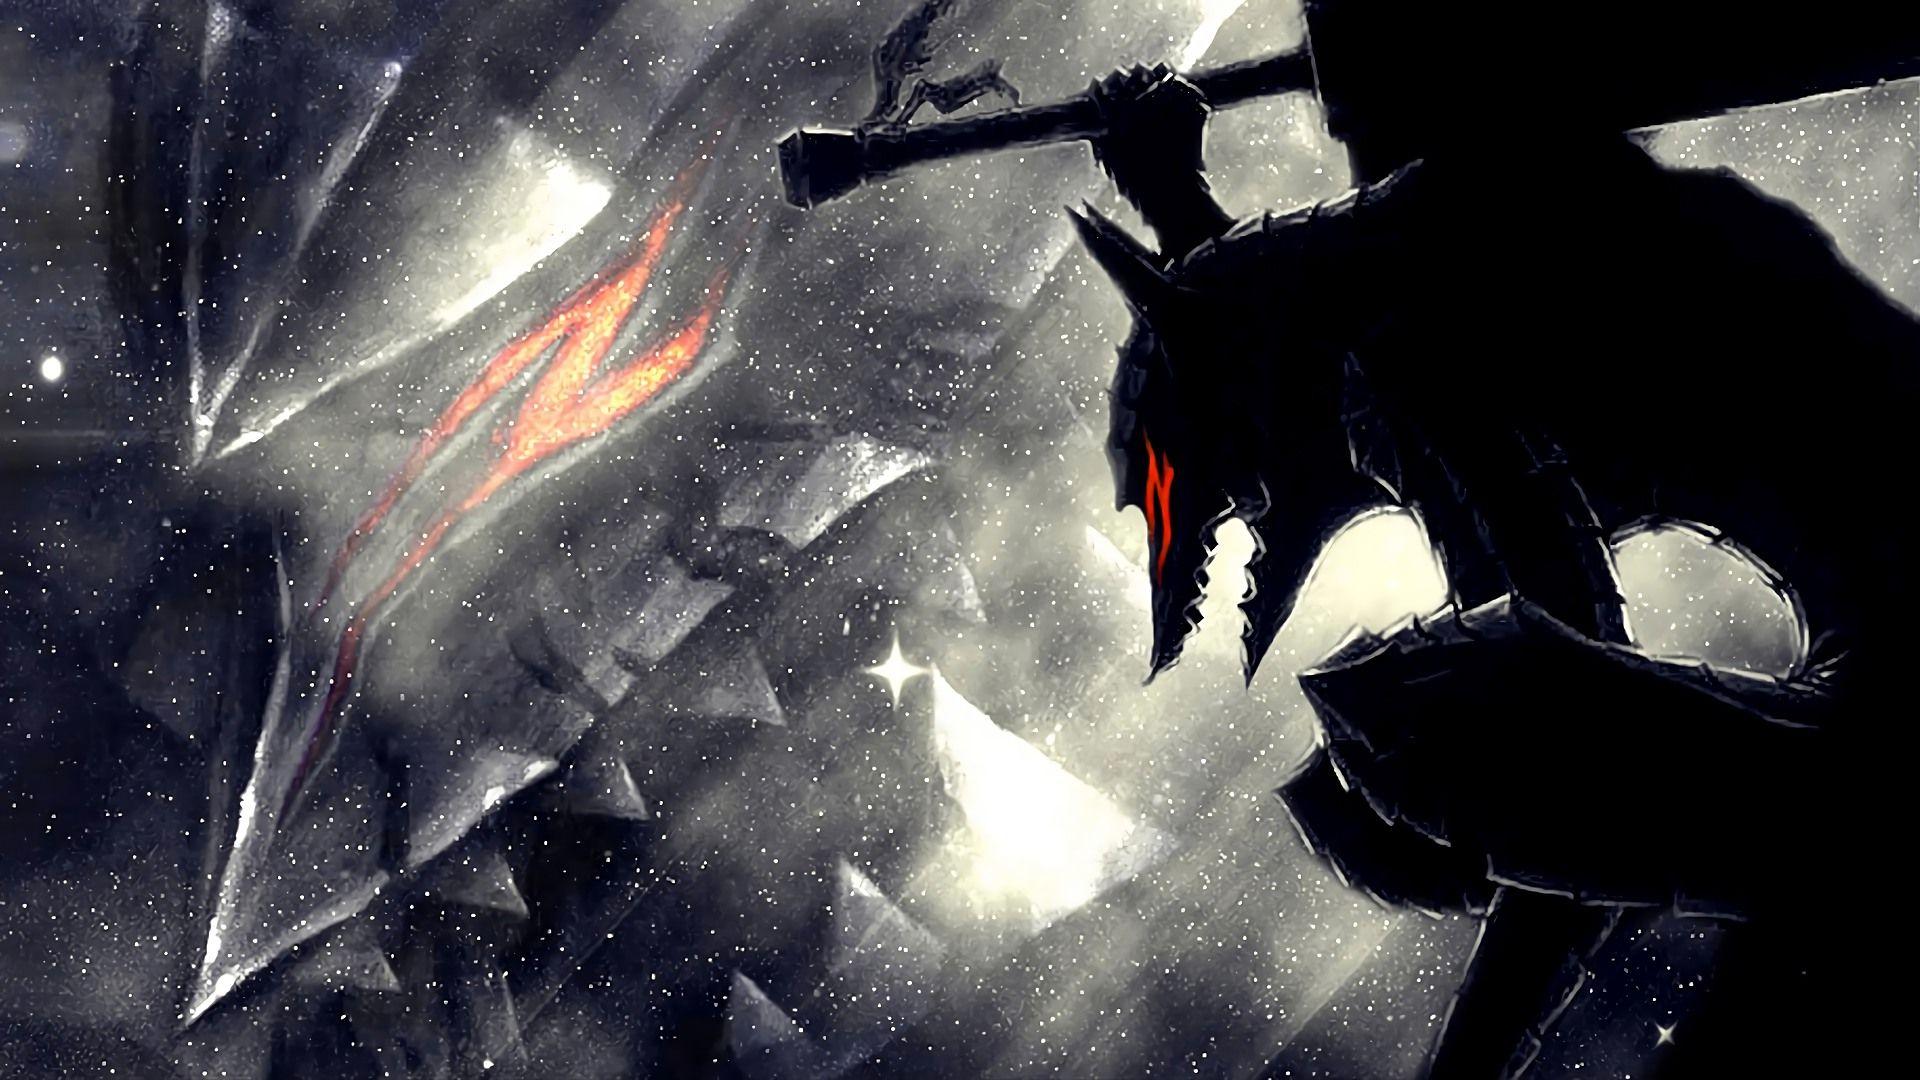 Guts Berserker Armor Berserk Wallpaper 5591 Berserk